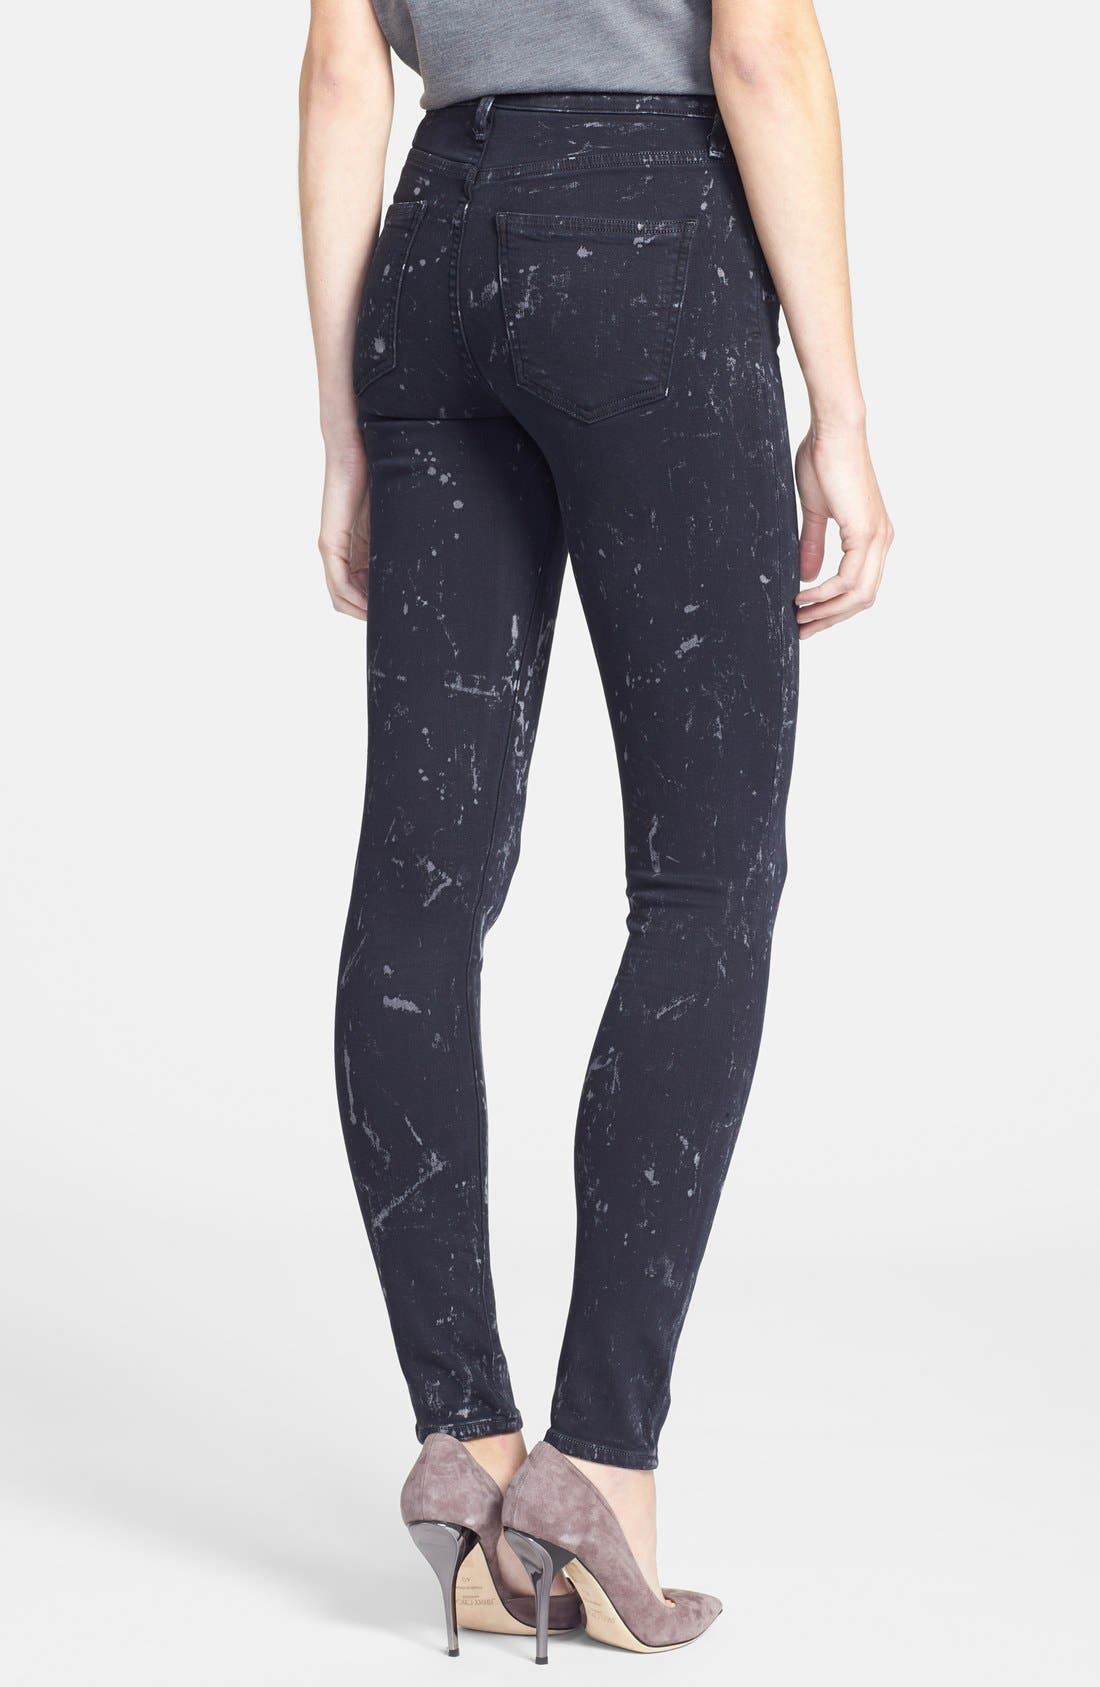 Alternate Image 2  - Citizens of Humanity 'Rocket' Skinny Jeans (Starry Black)